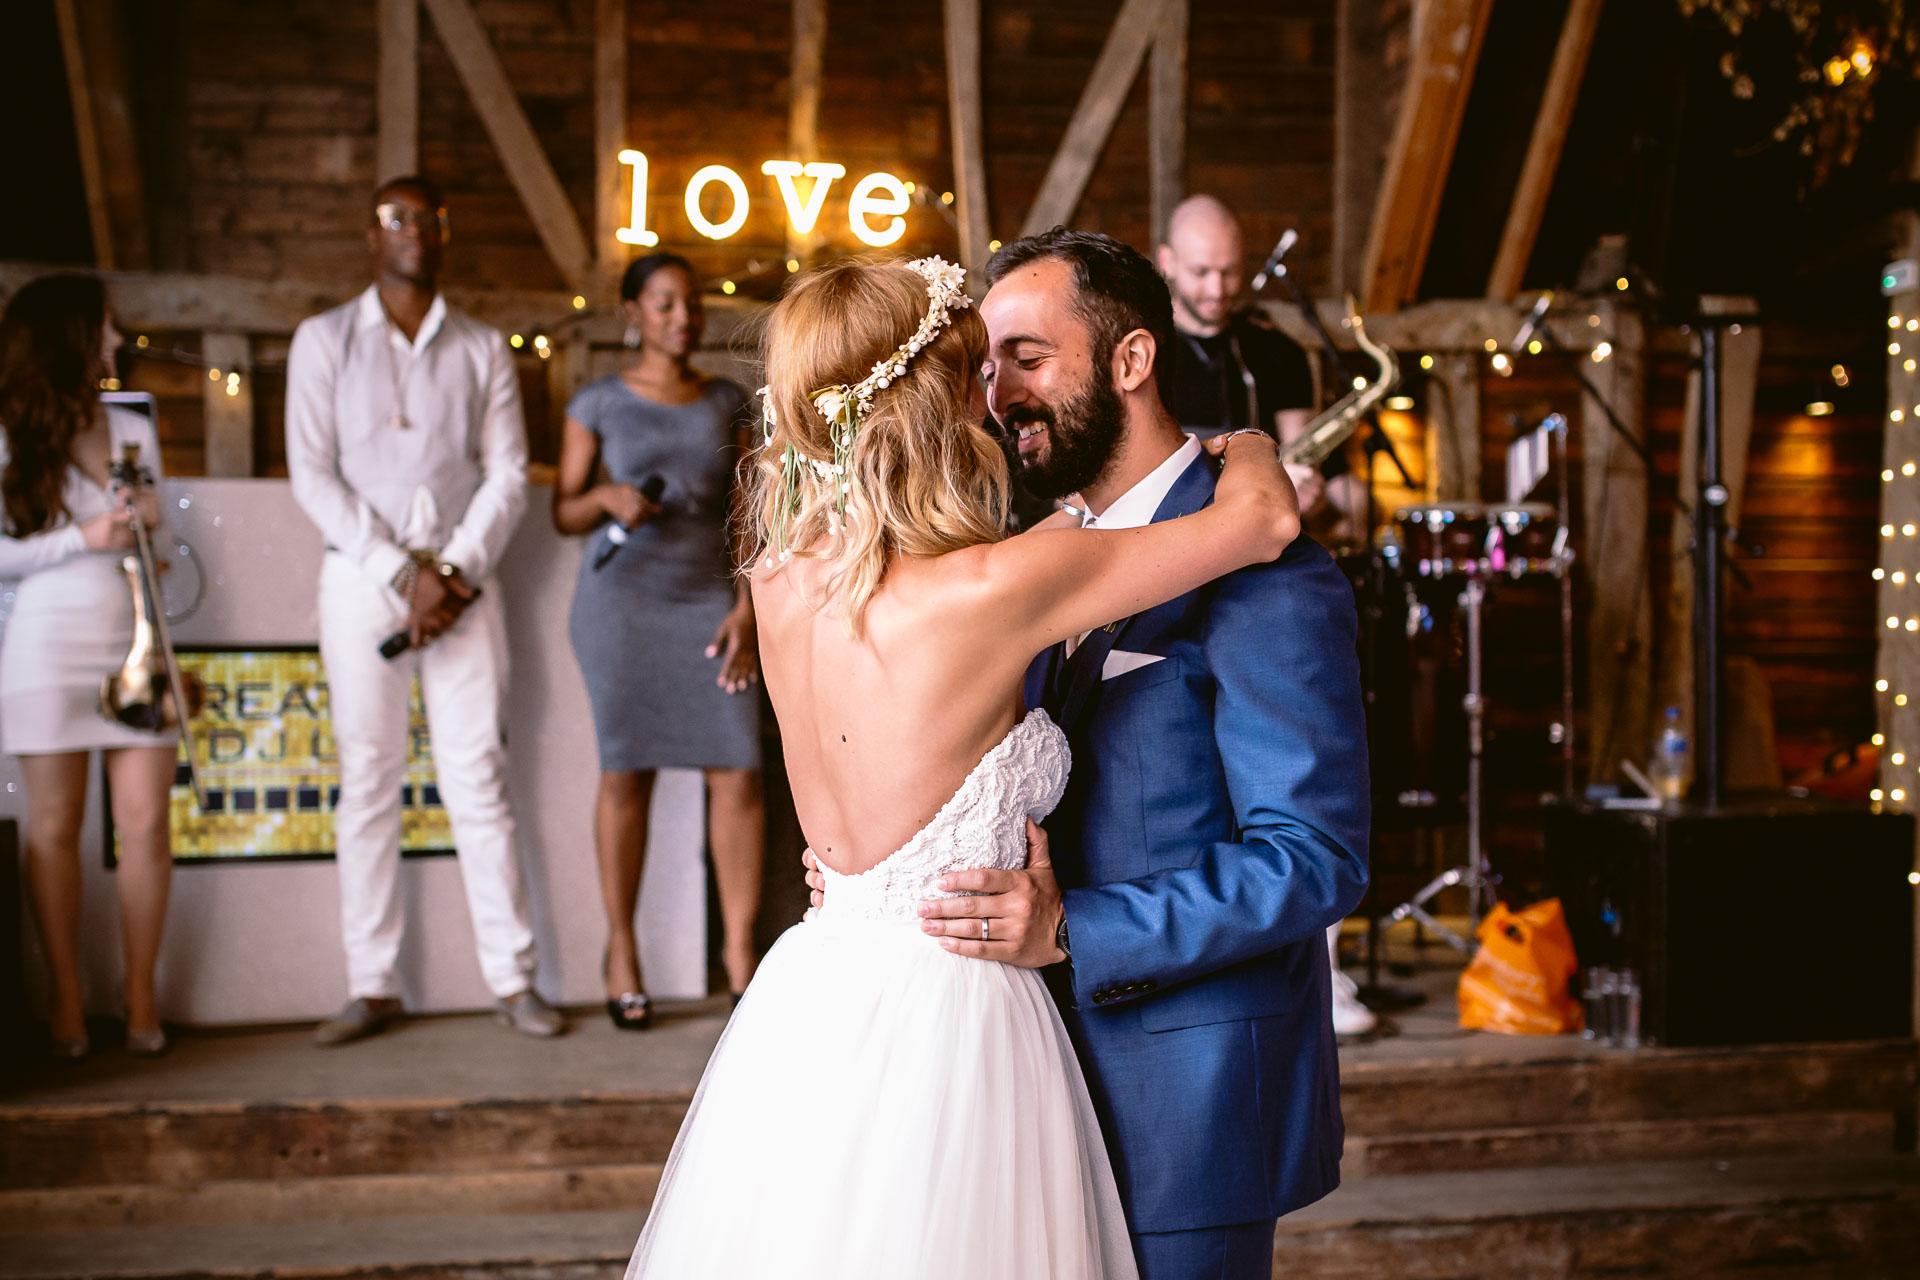 preston court boho wedding alexia and dan bride and groom dancing on the dance floor first dance